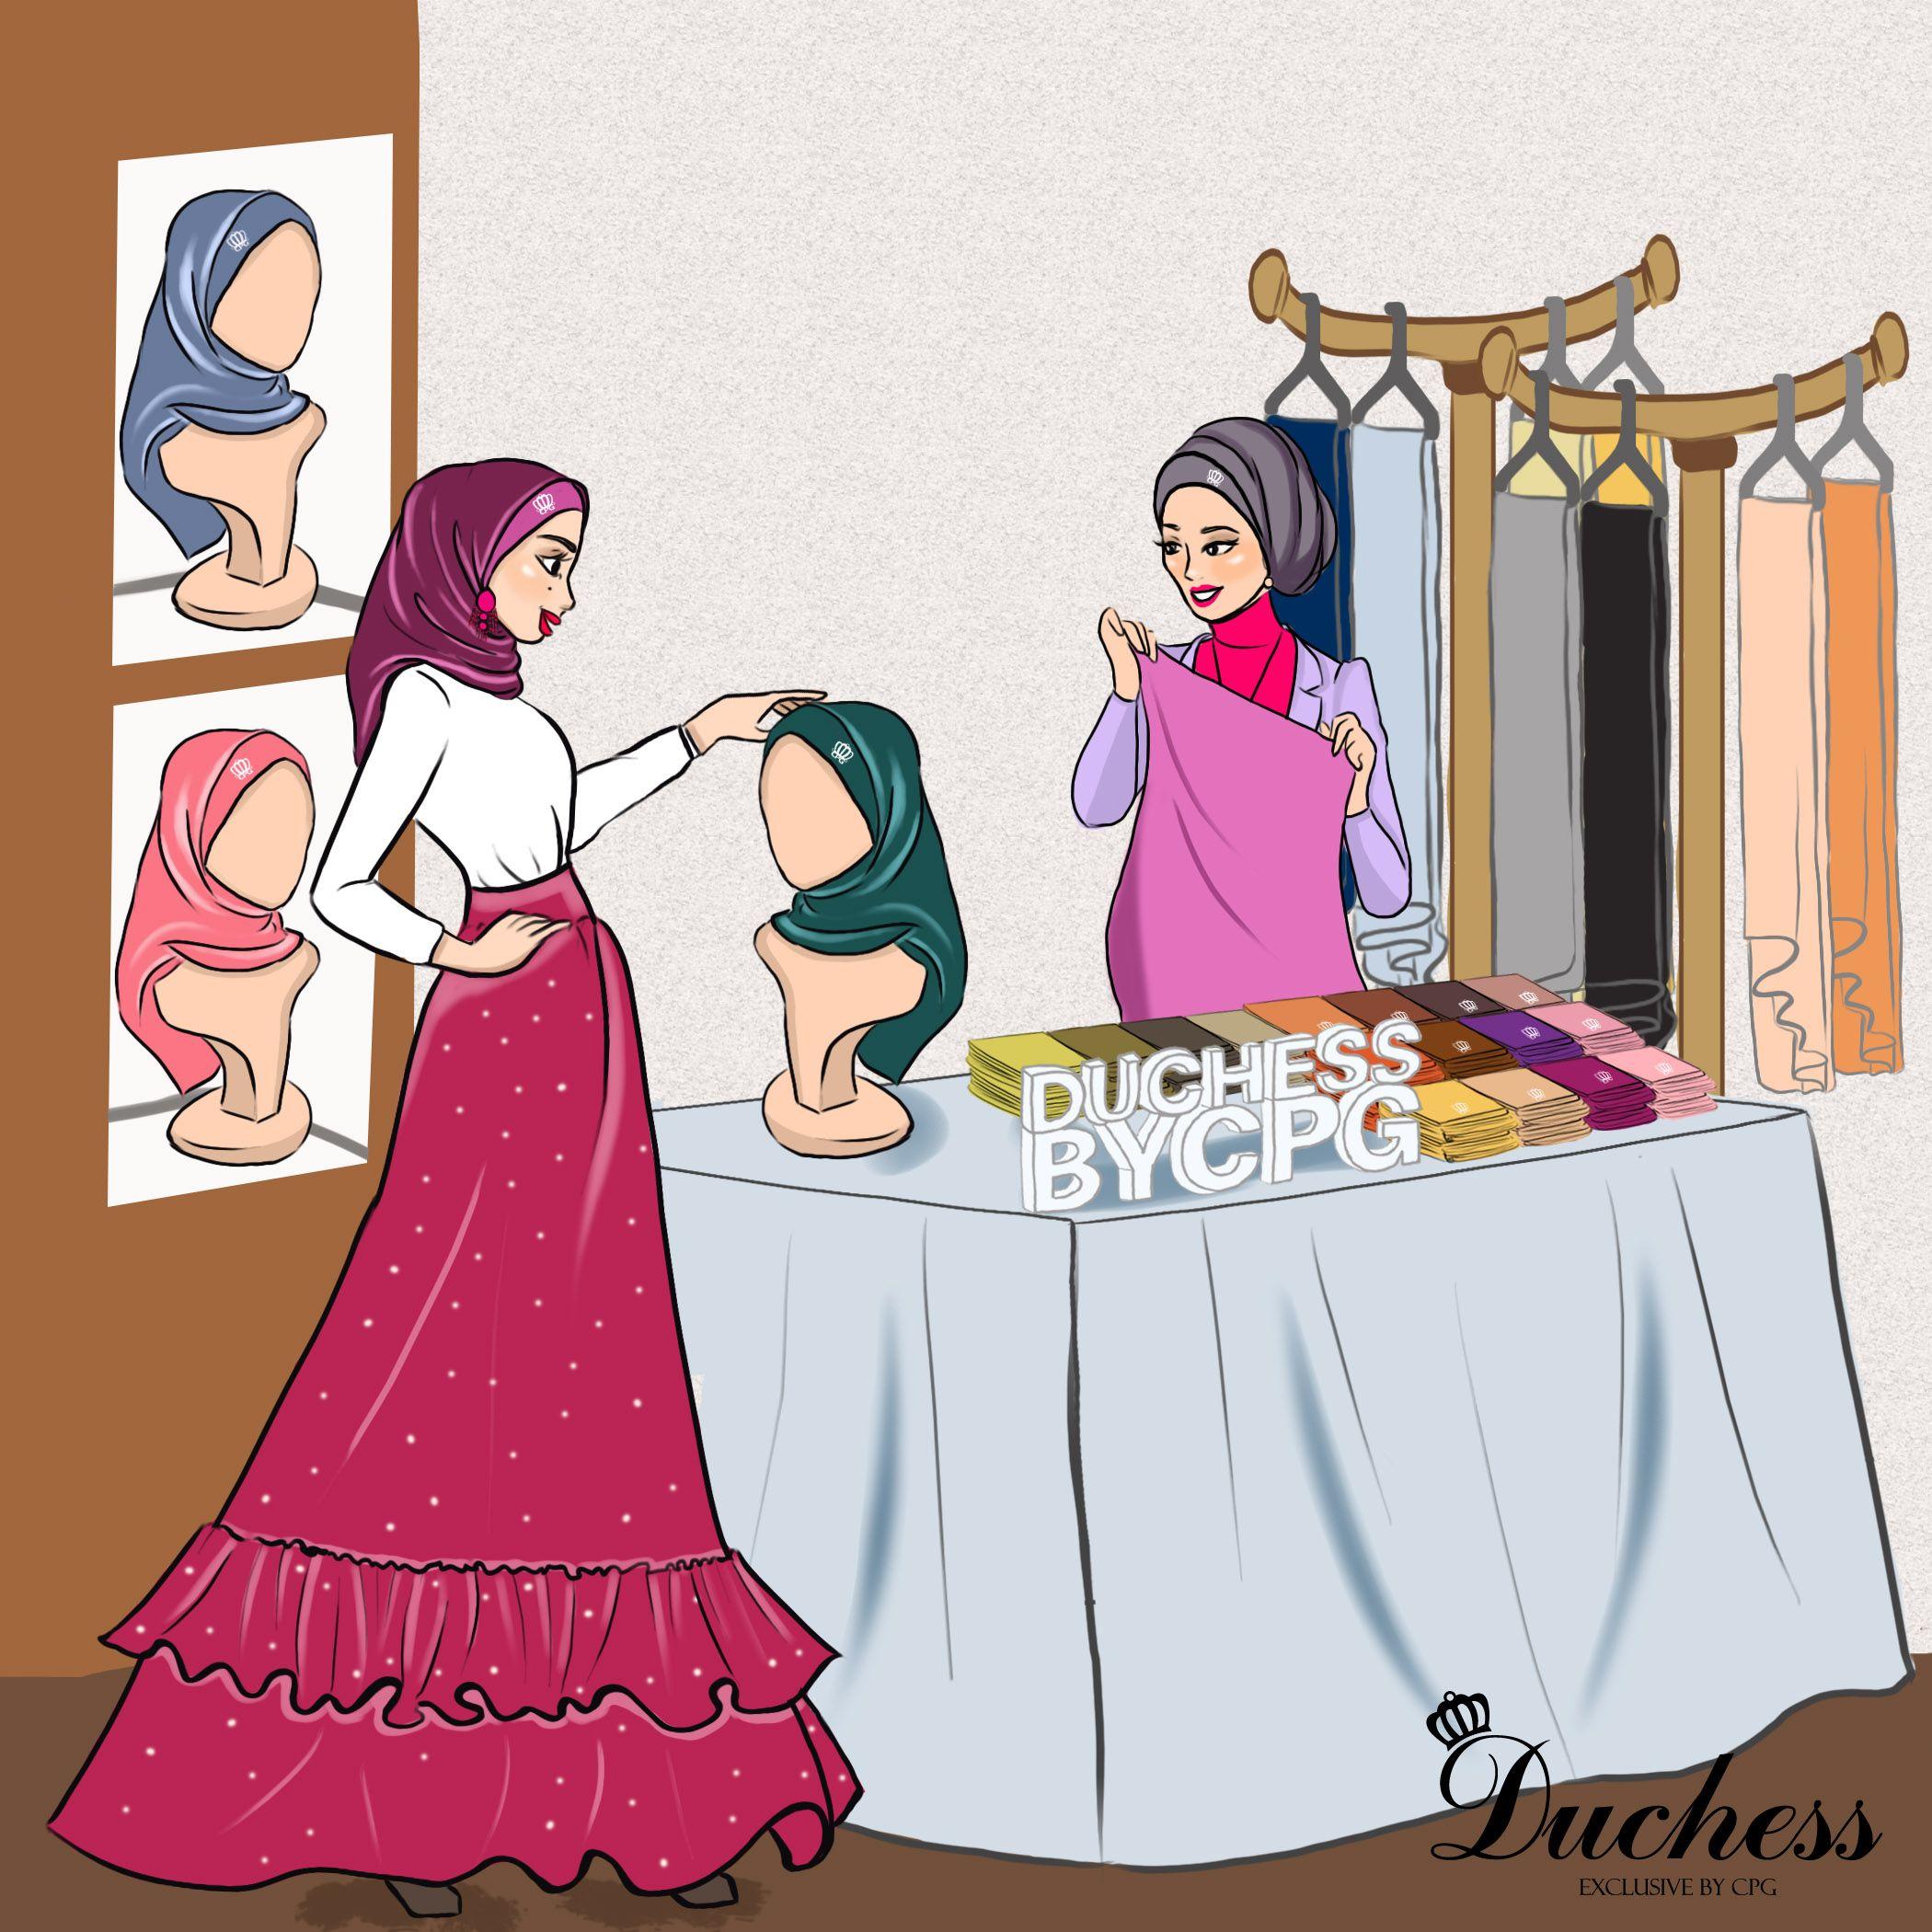 DUCHESS CPG Illustration By Namirahsketches